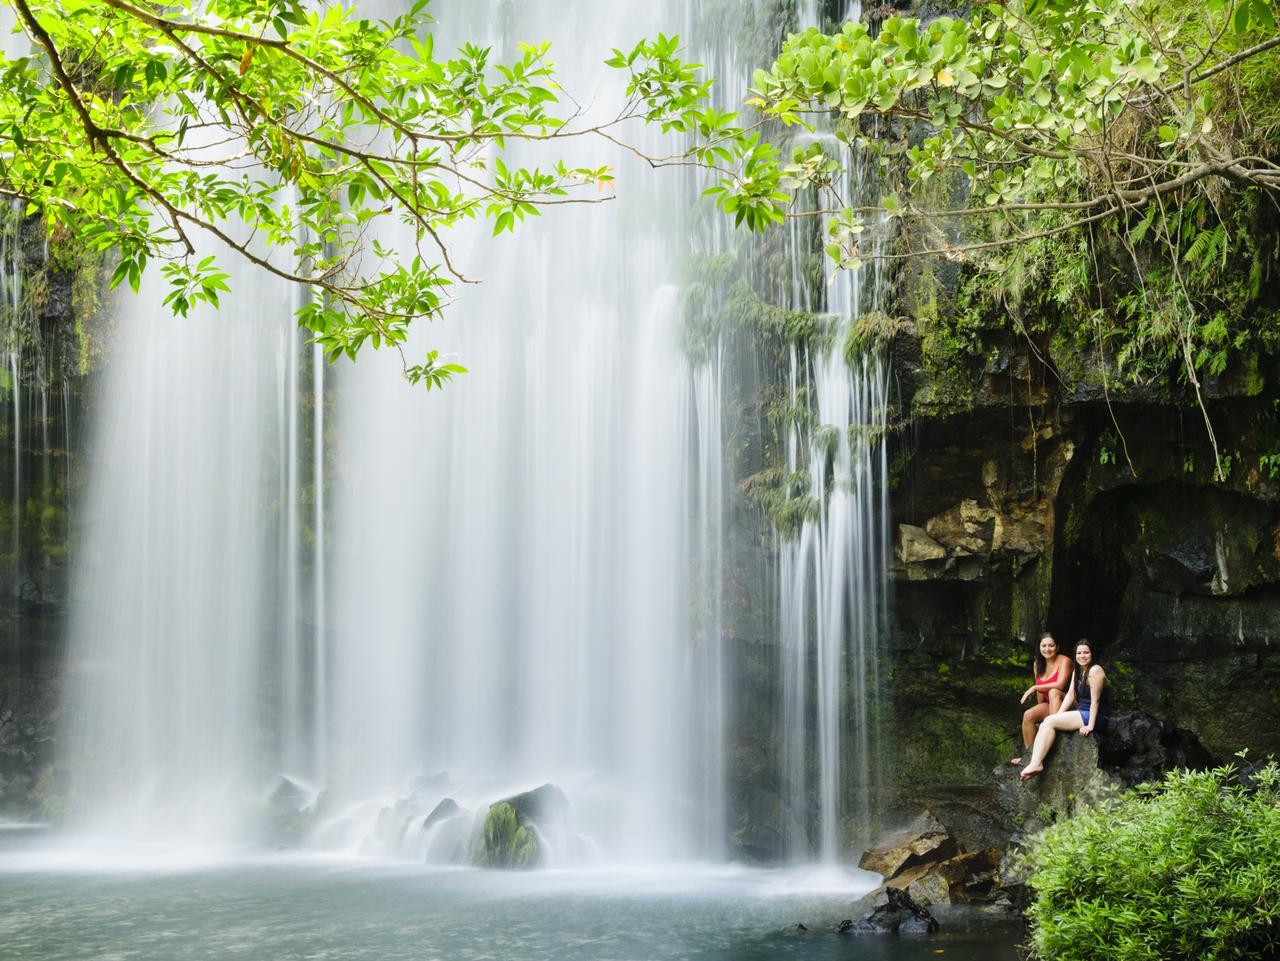 Two women relaxing next to a waterfall. Llanos de Cortes Waterfall in Bagaces, Guanacaste, Costa Rica